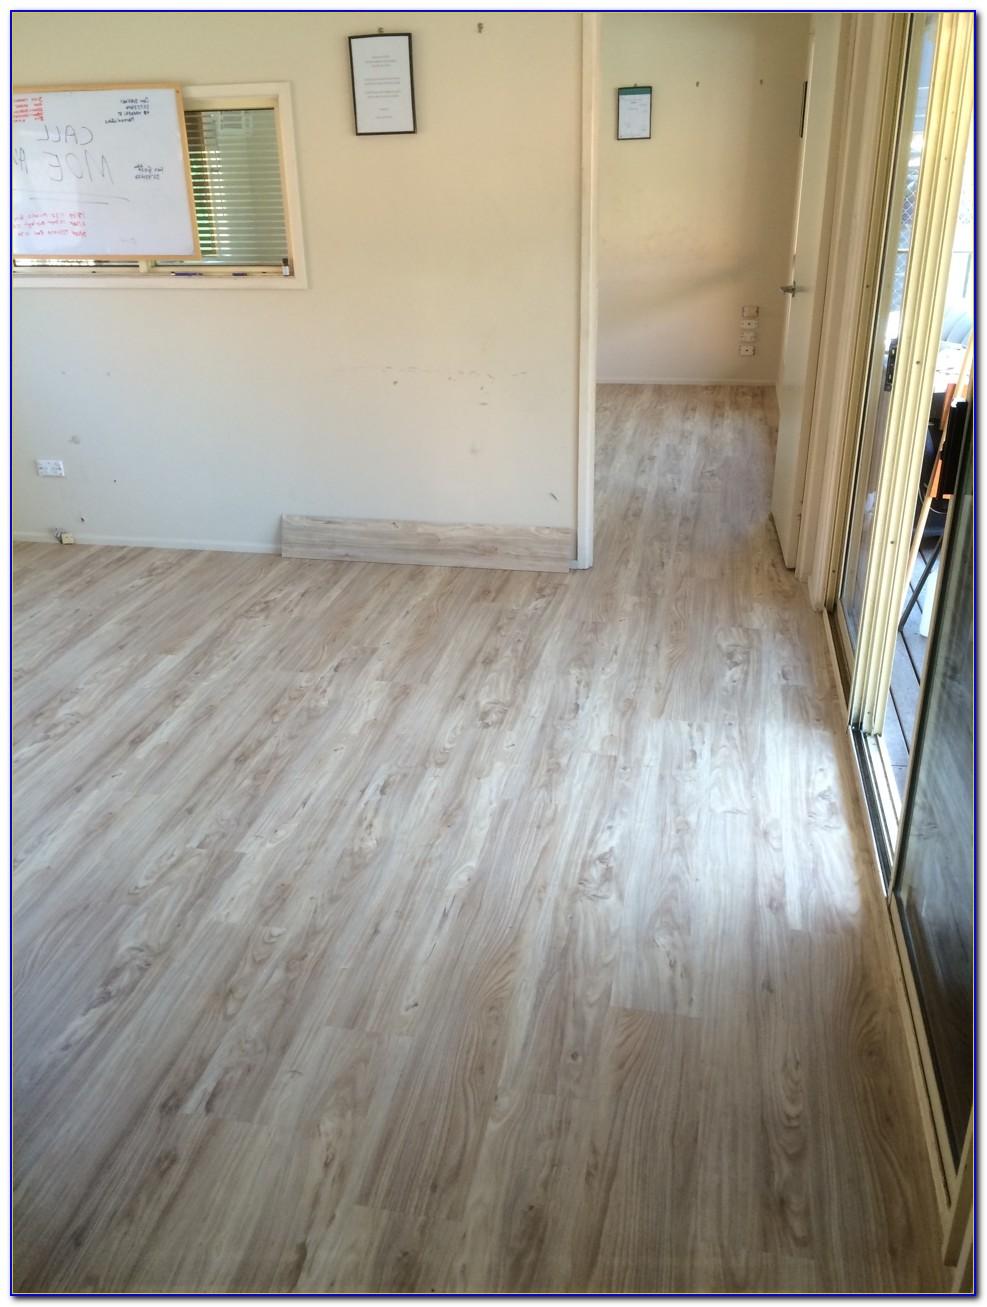 Loose Lay Vinyl Plank Flooring Menards Home Design Ideas Onexxeep